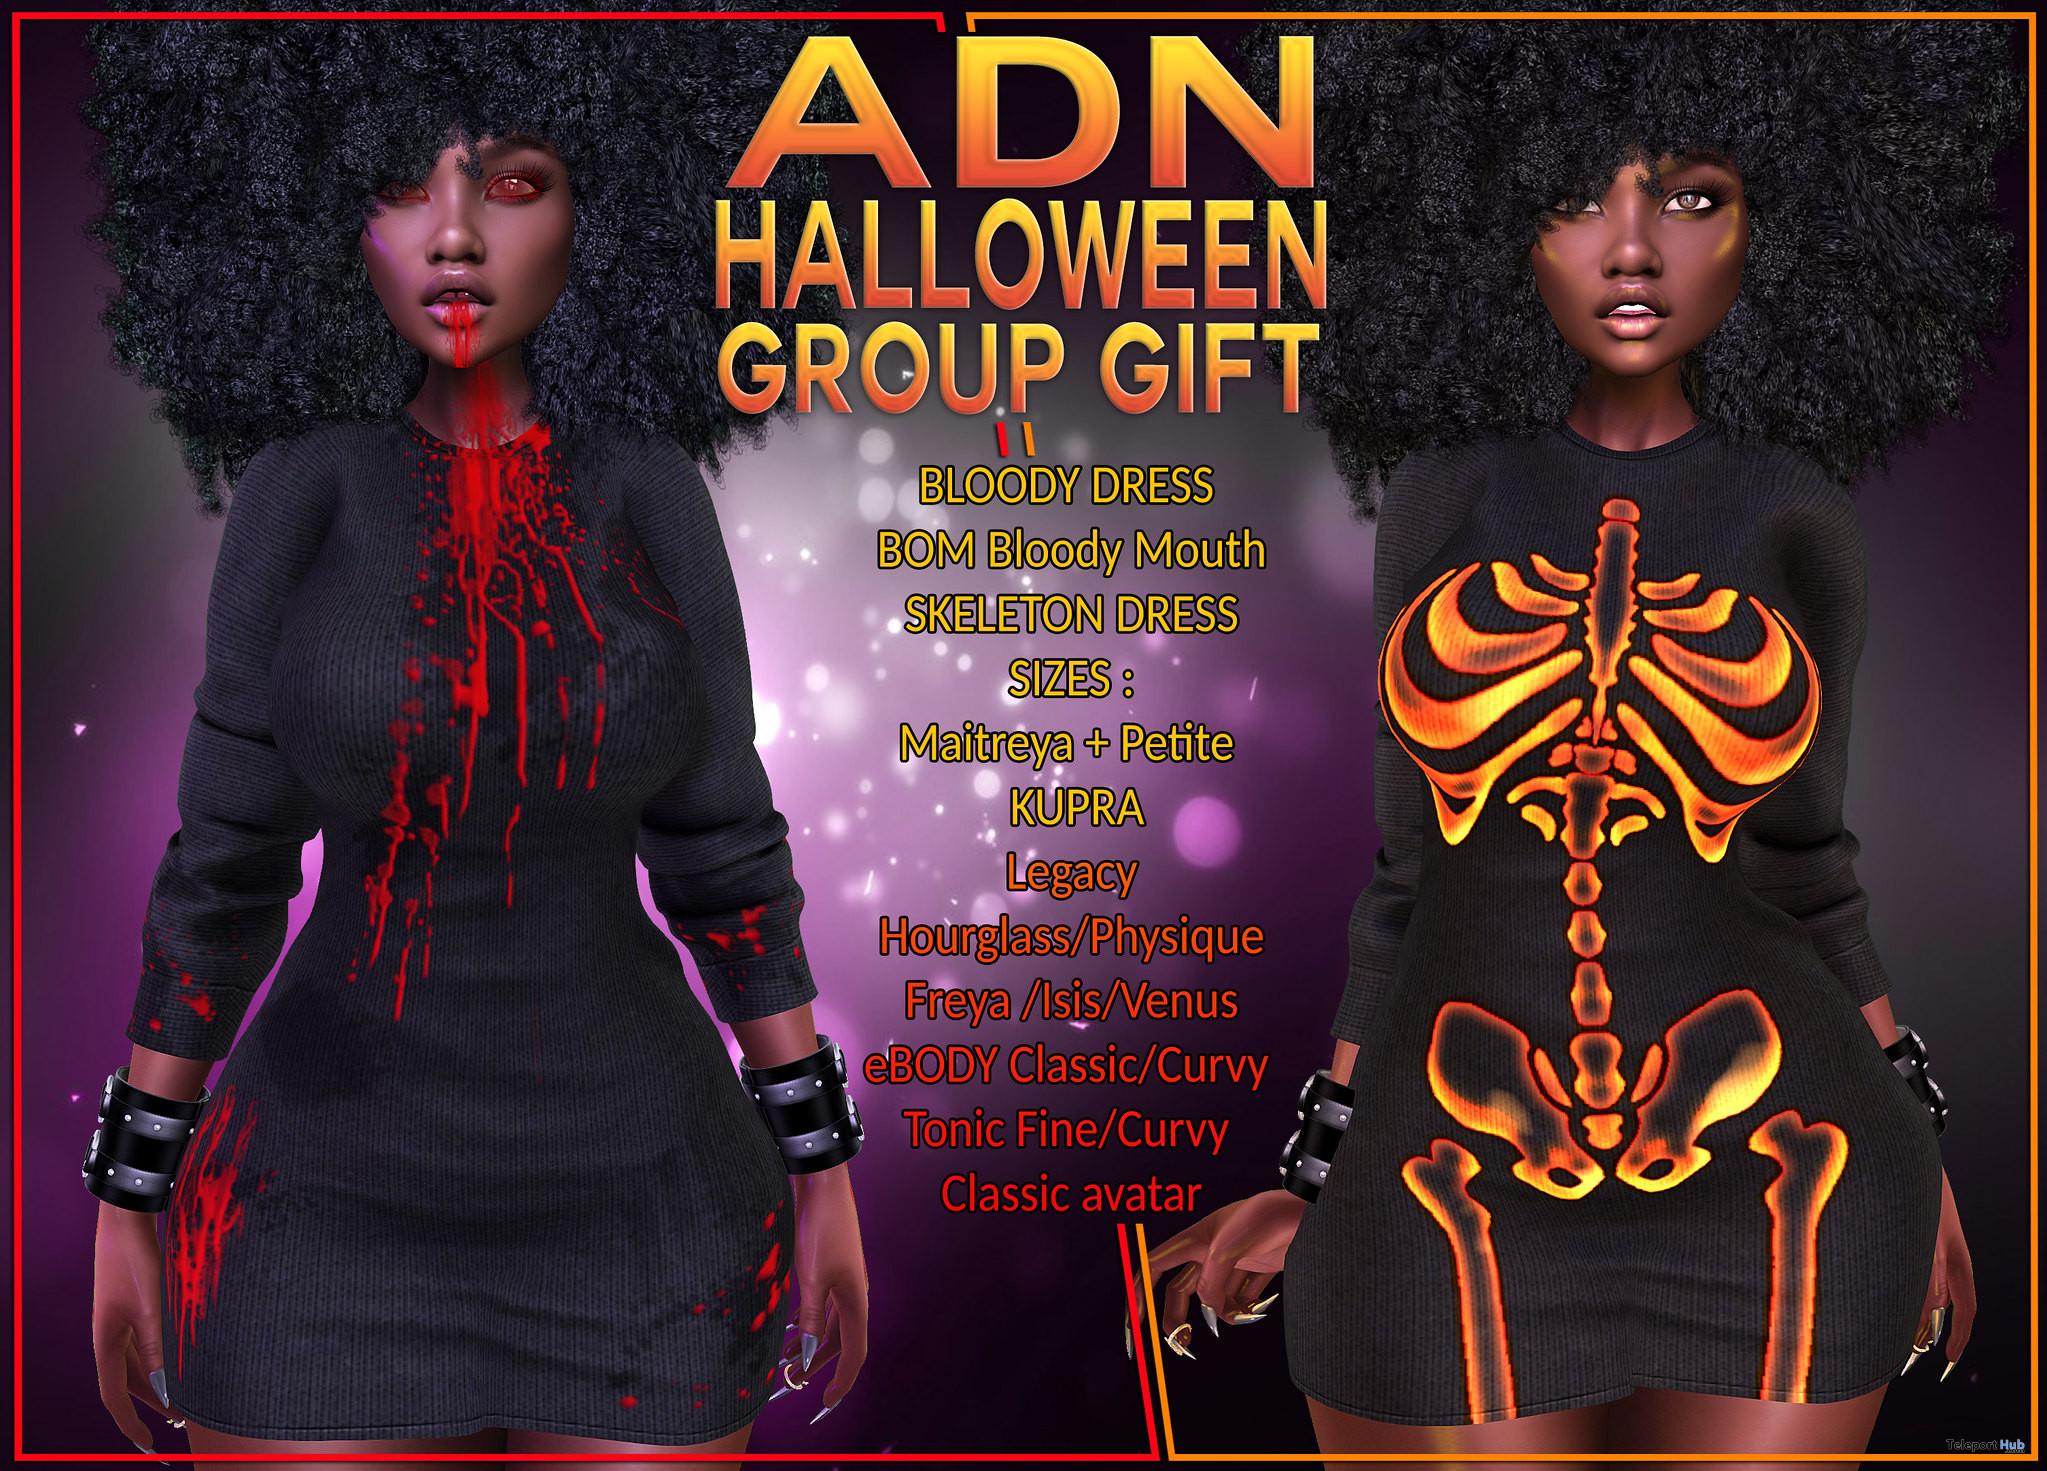 Skeleton Dress, Bloody Dress, & Tattoo October 2021 Group Gift by ADN Designs - Teleport Hub - teleporthub.com